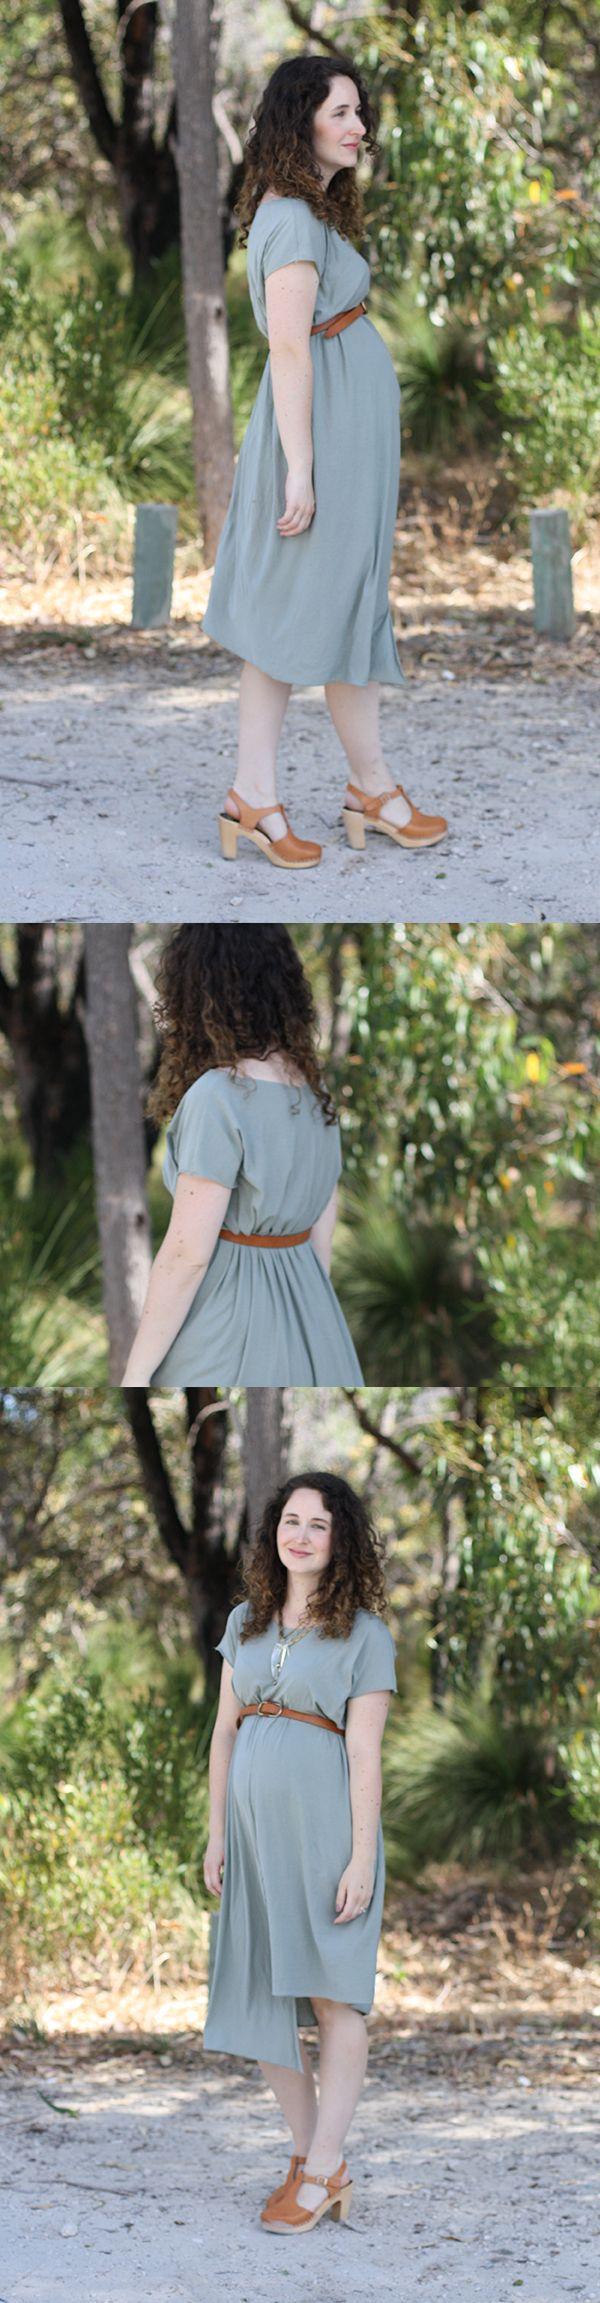 Two seam dress and top tutorial. Genius.